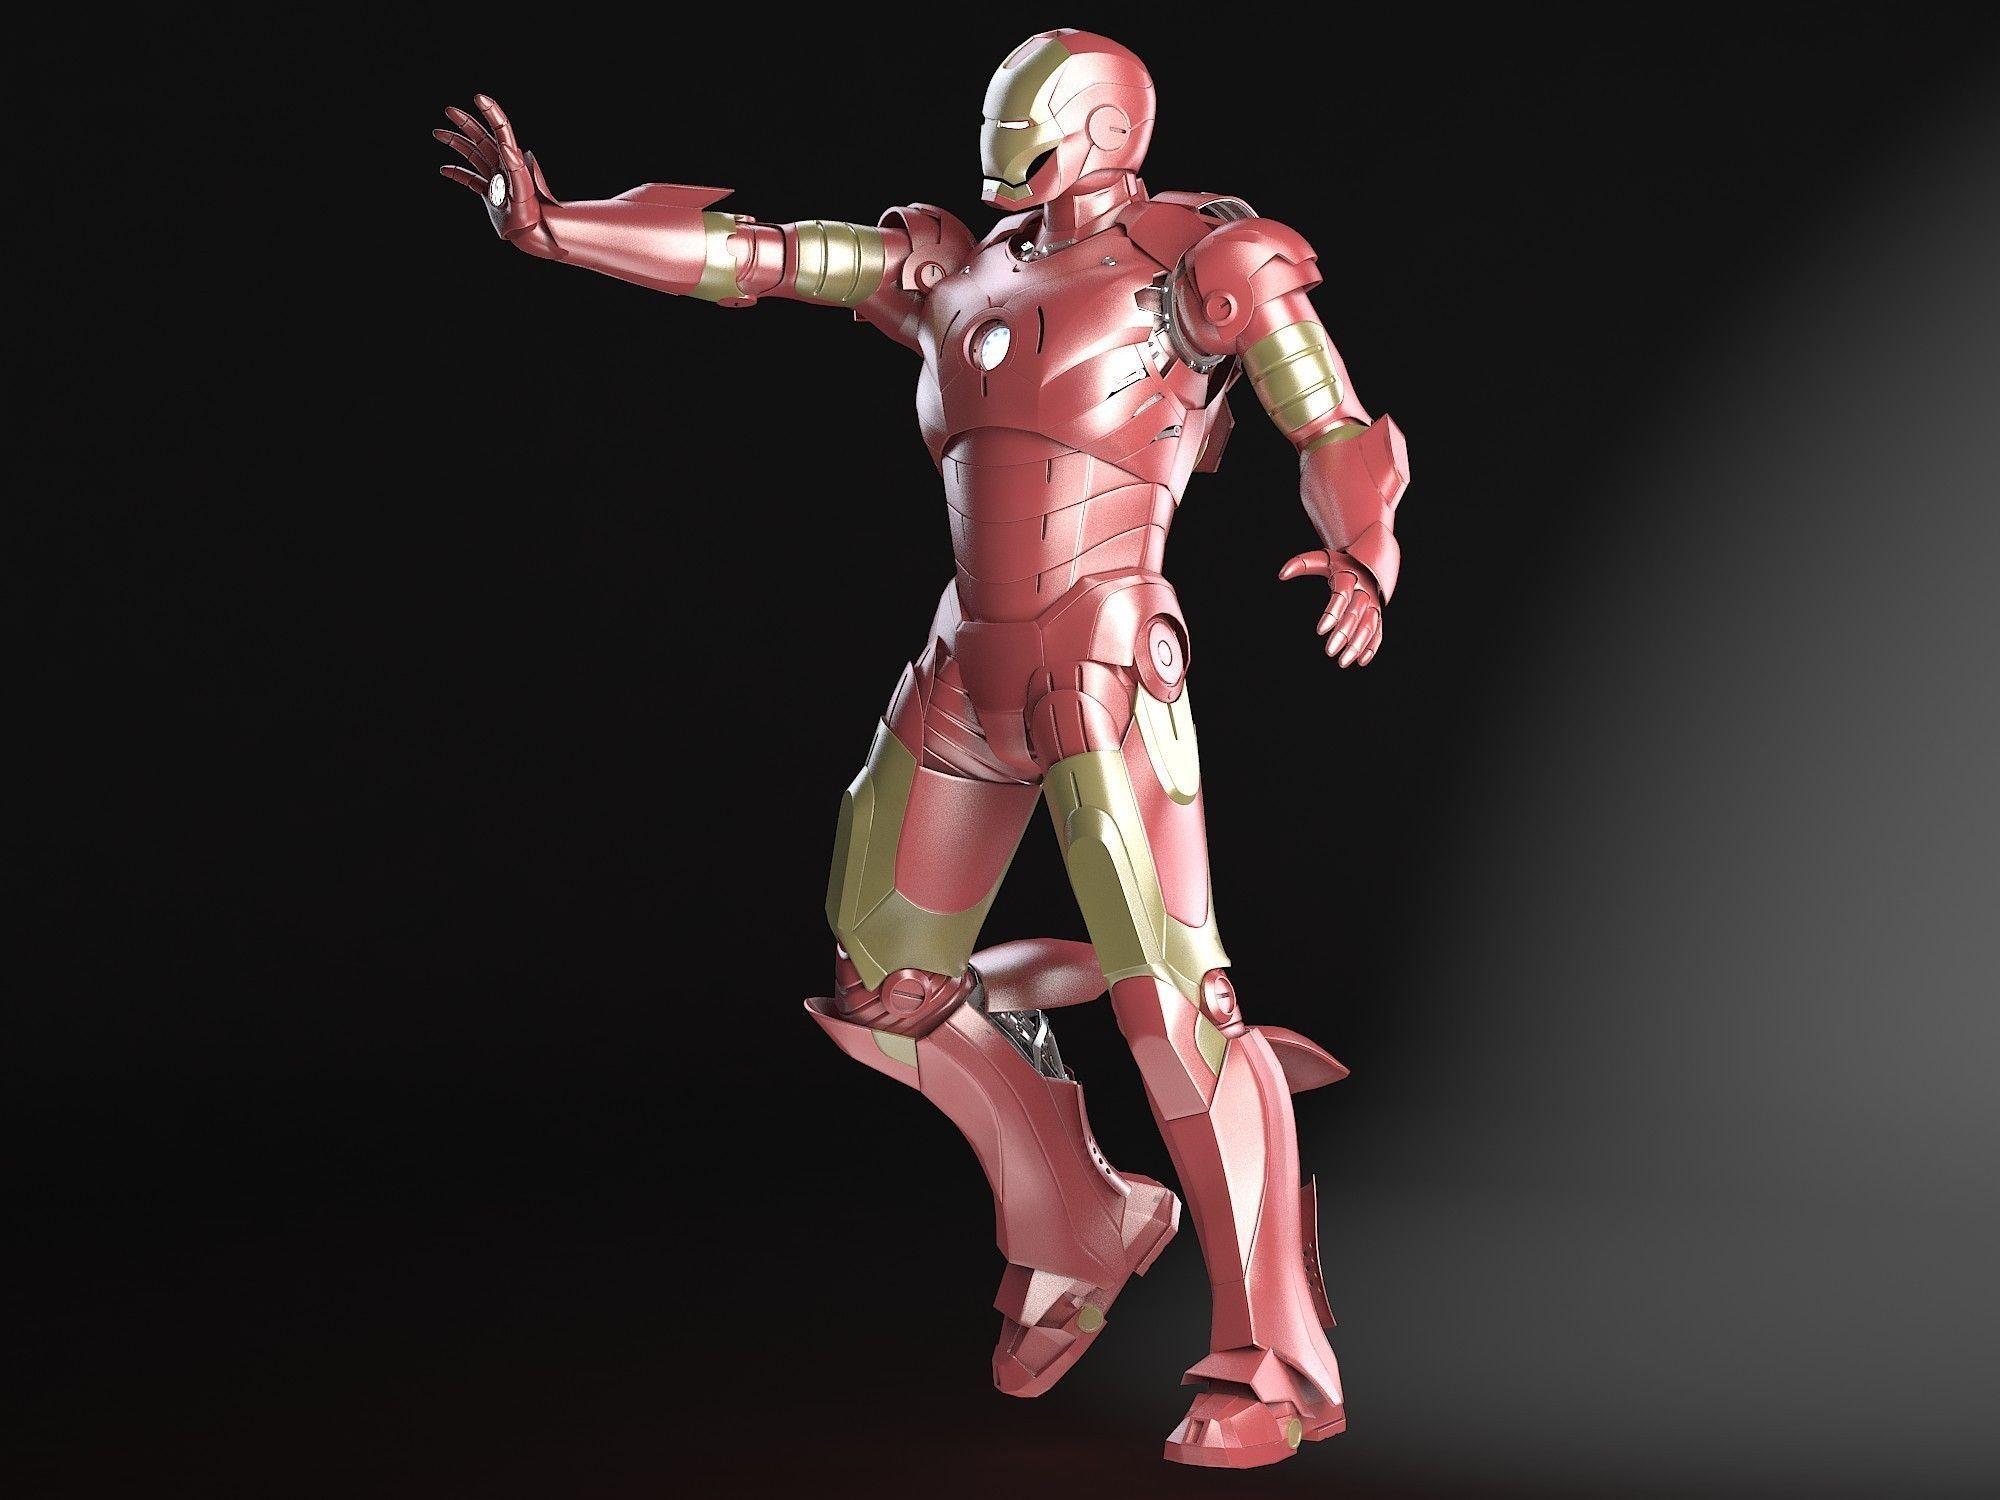 3c6f3a29d63 Iron Man Tony Stark Rigged | 3D model